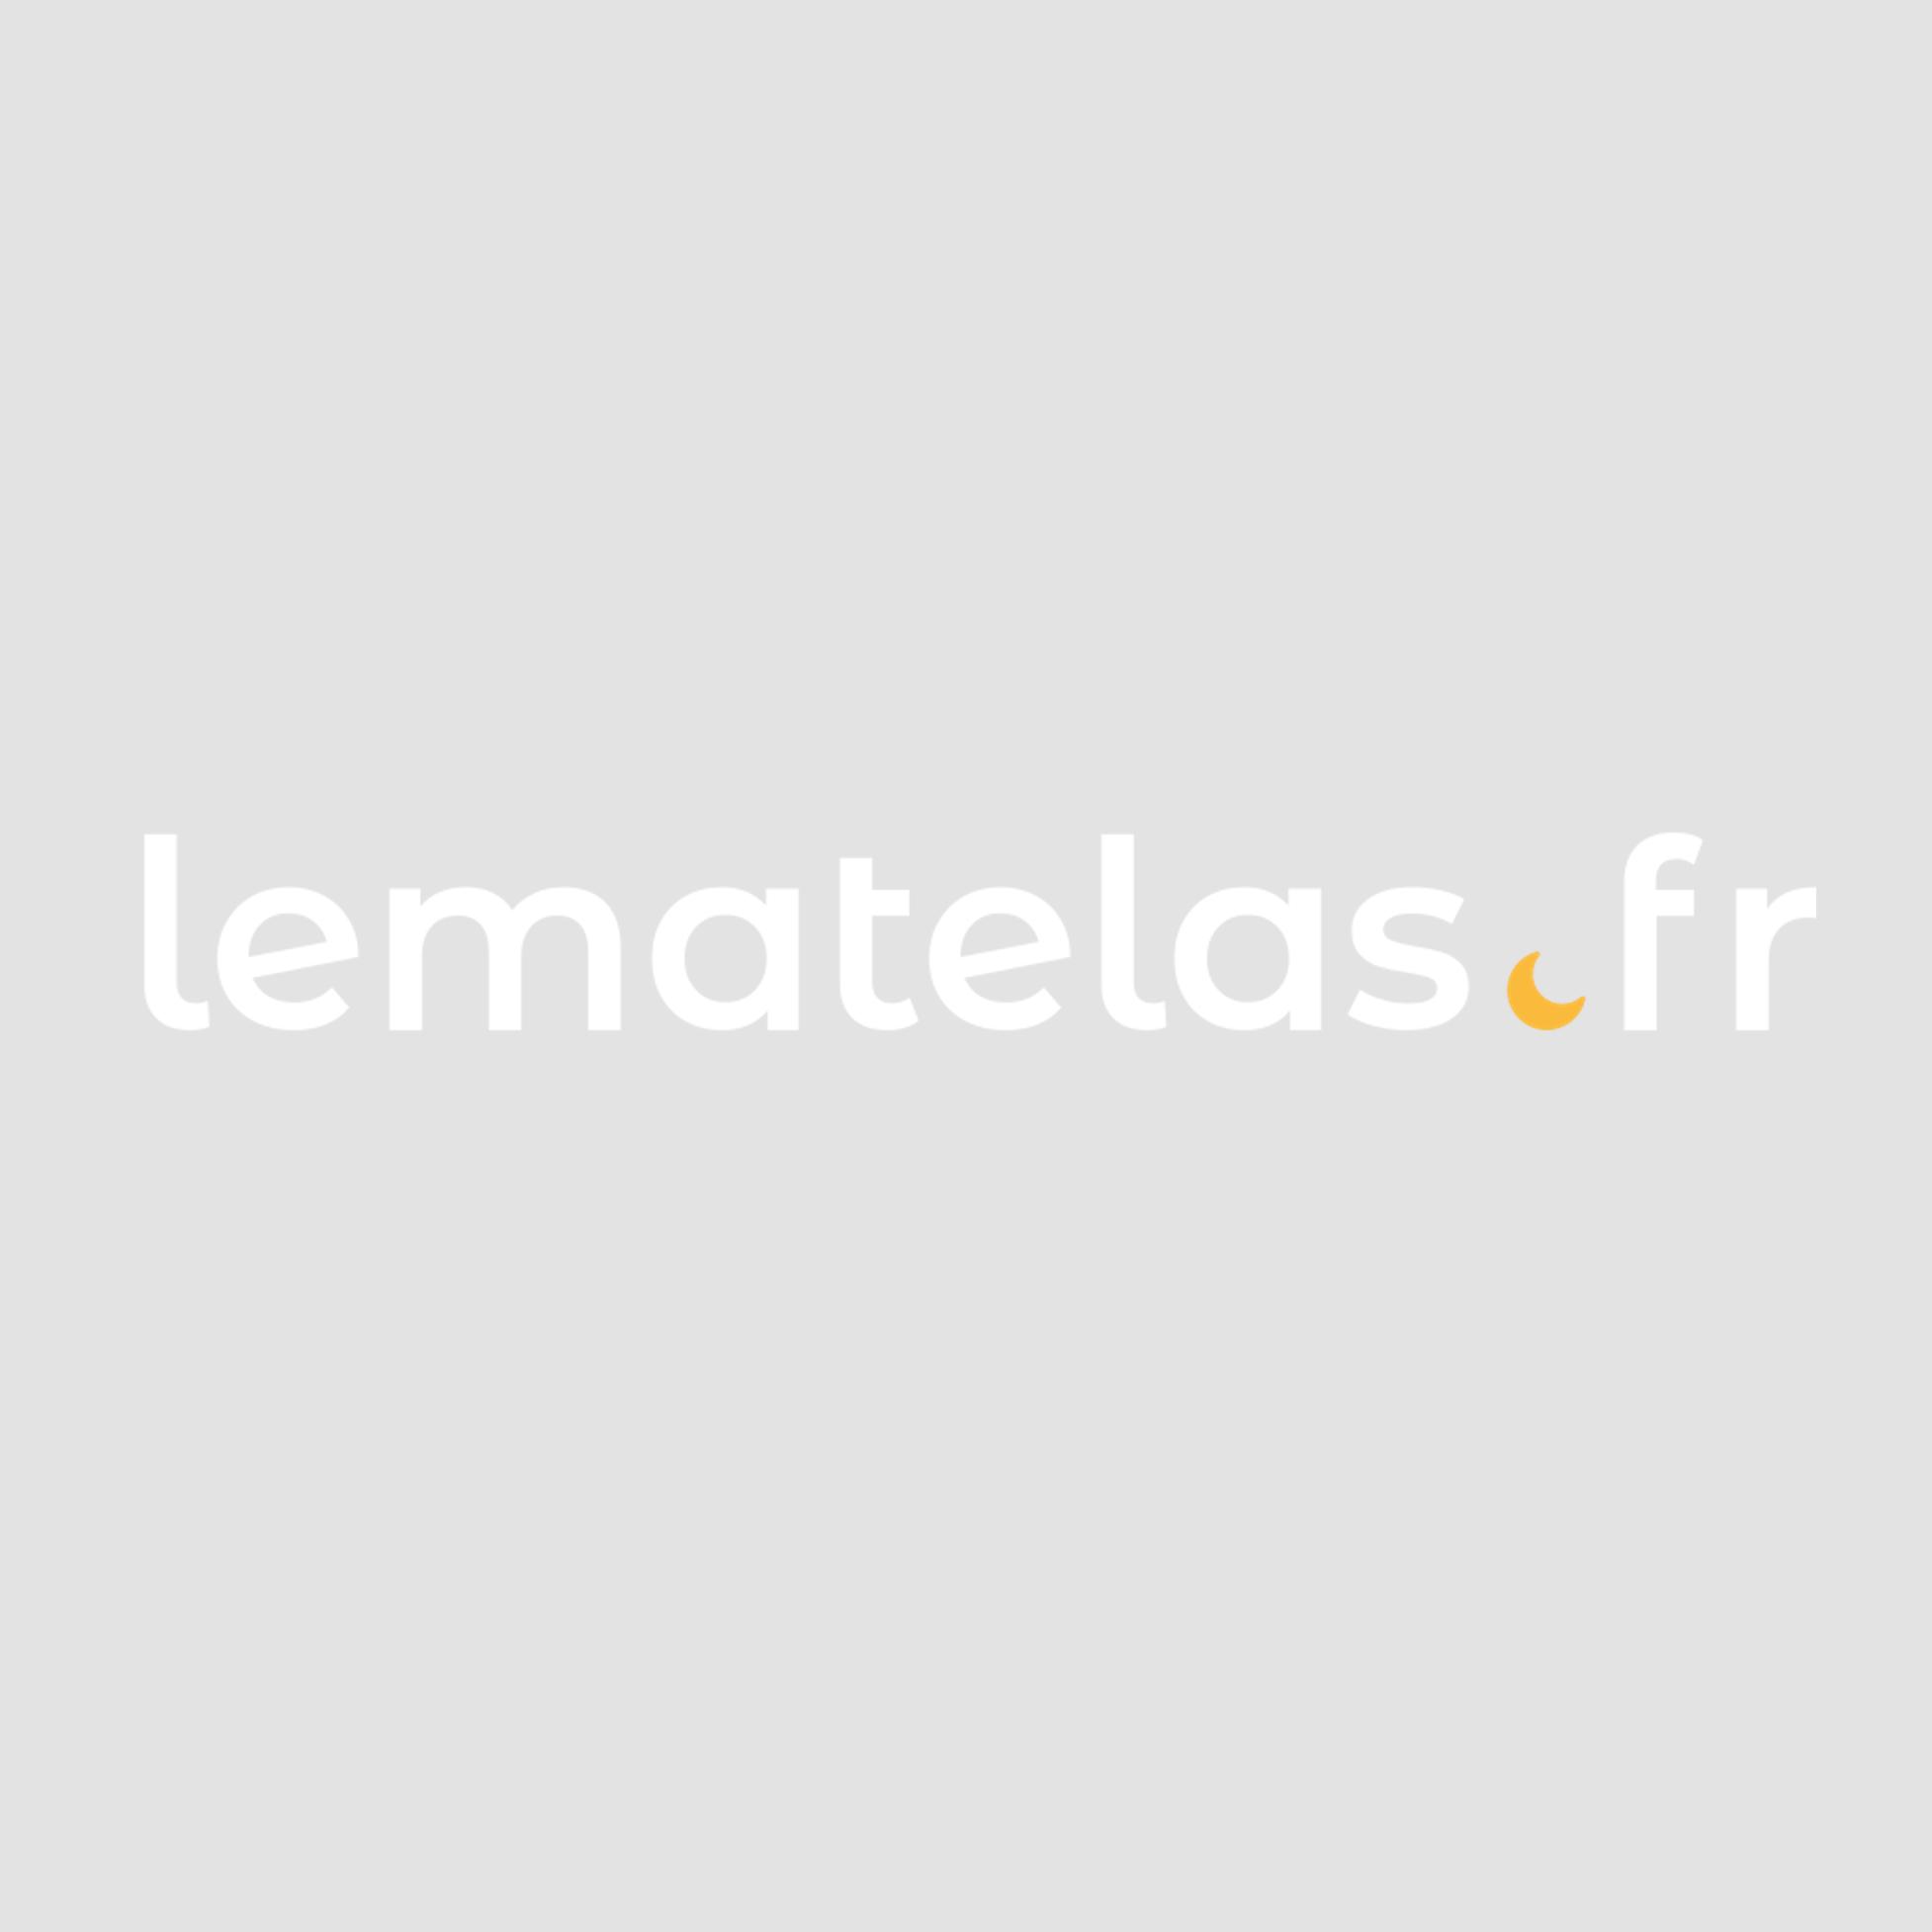 Epeda Drap housse protège matelas imperméable 2 en 1 EPEDA bleu 120x190/200